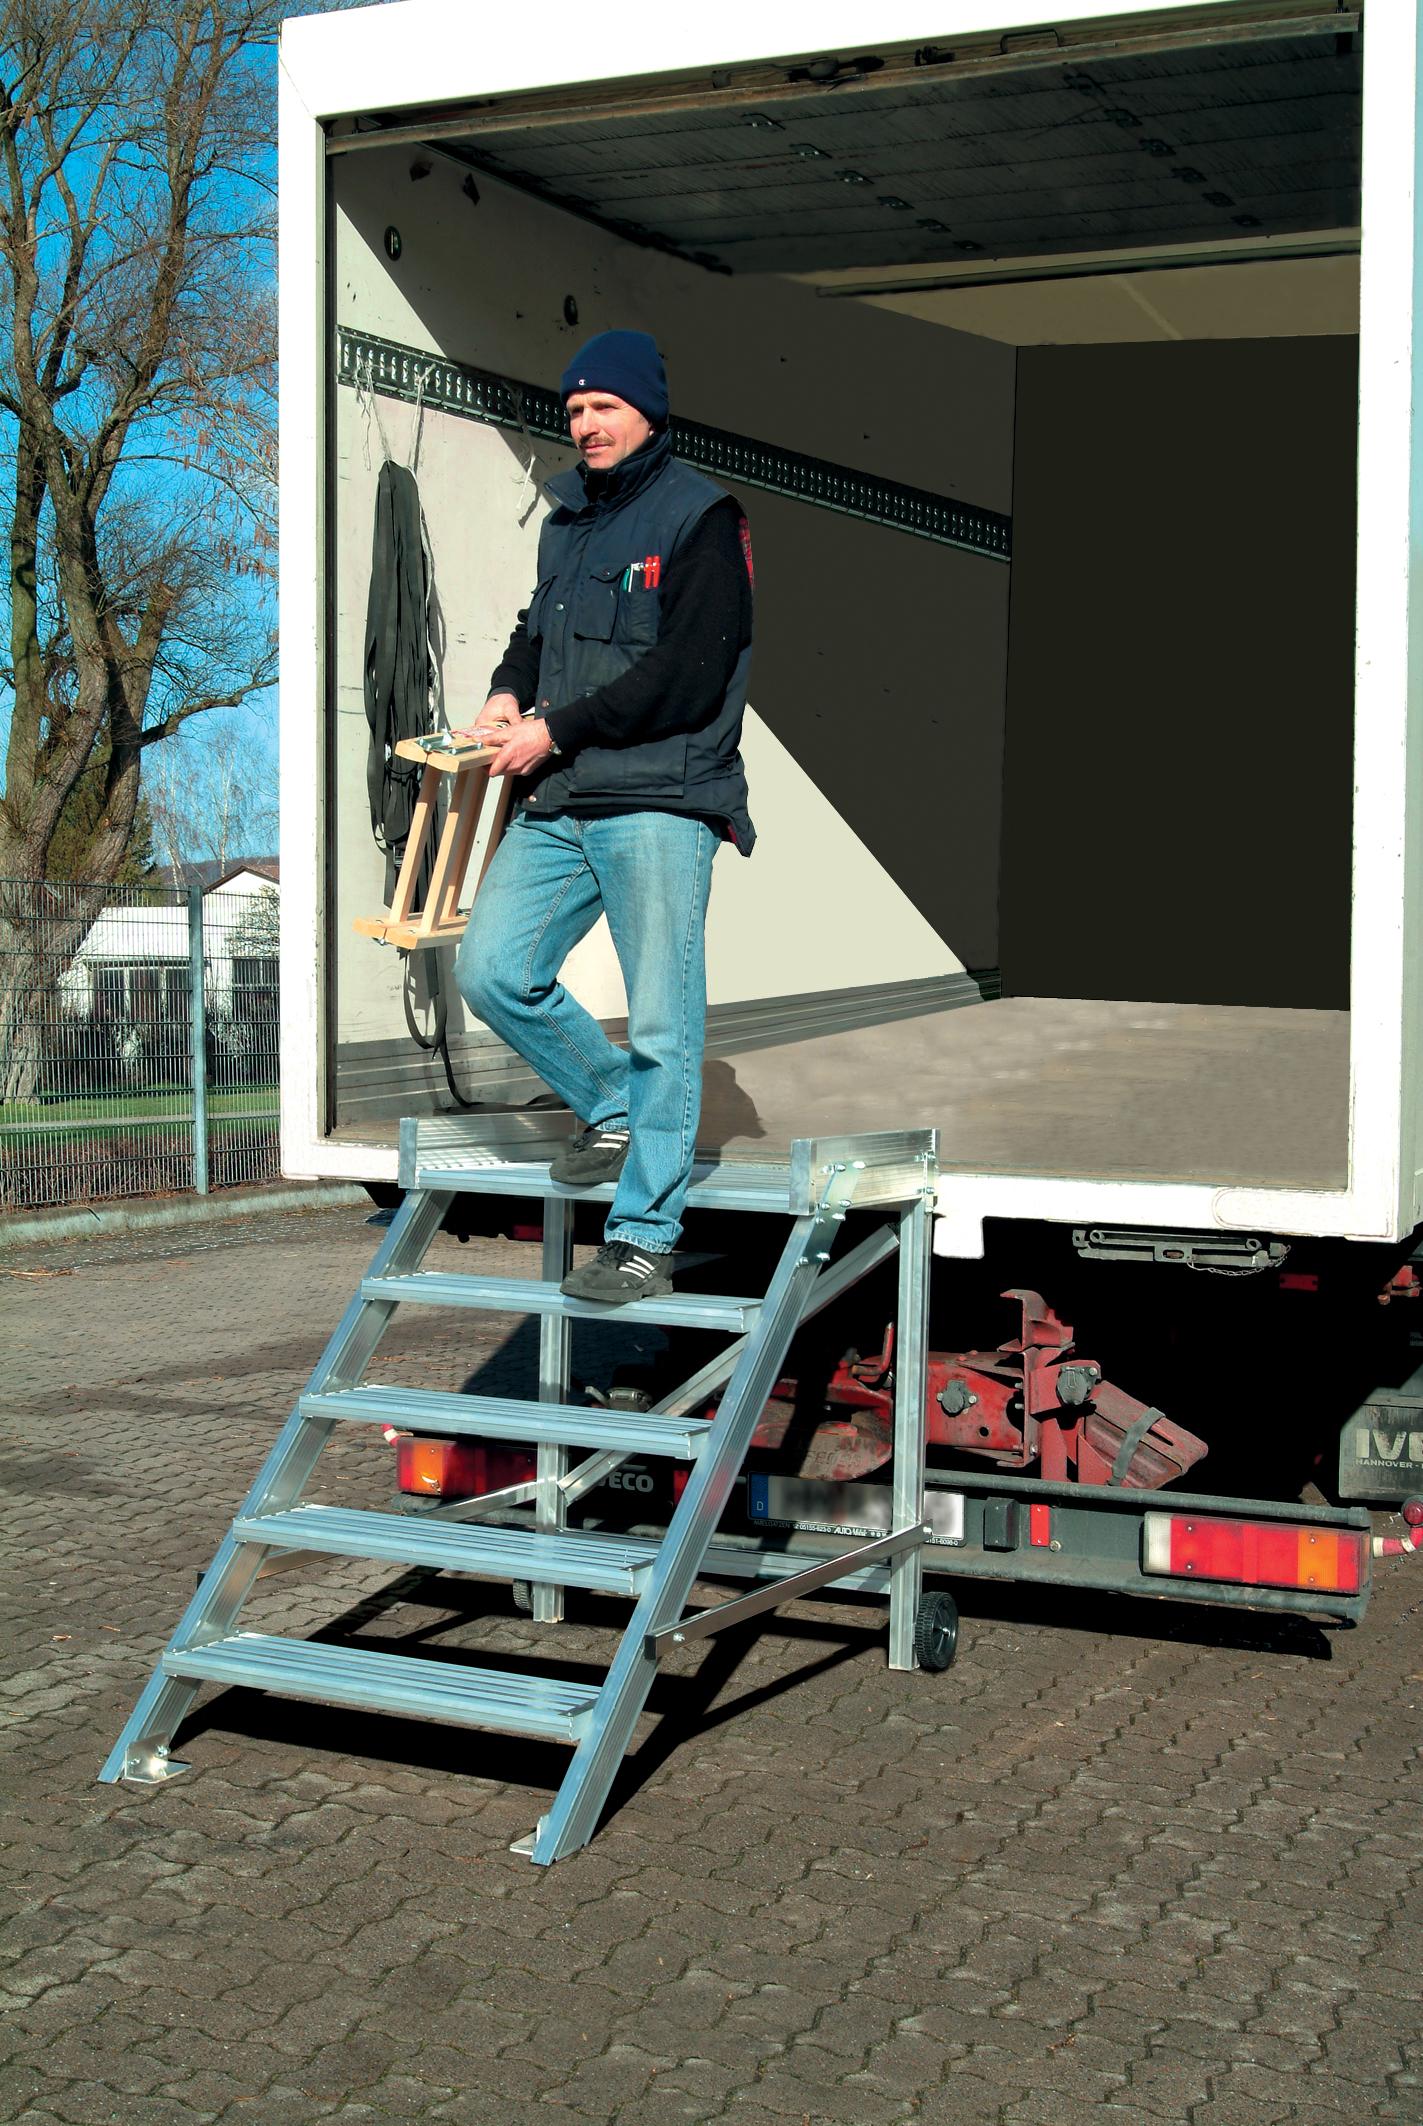 podest treppe fahrbar leichtmetall 2 stufen 600 mm. Black Bedroom Furniture Sets. Home Design Ideas